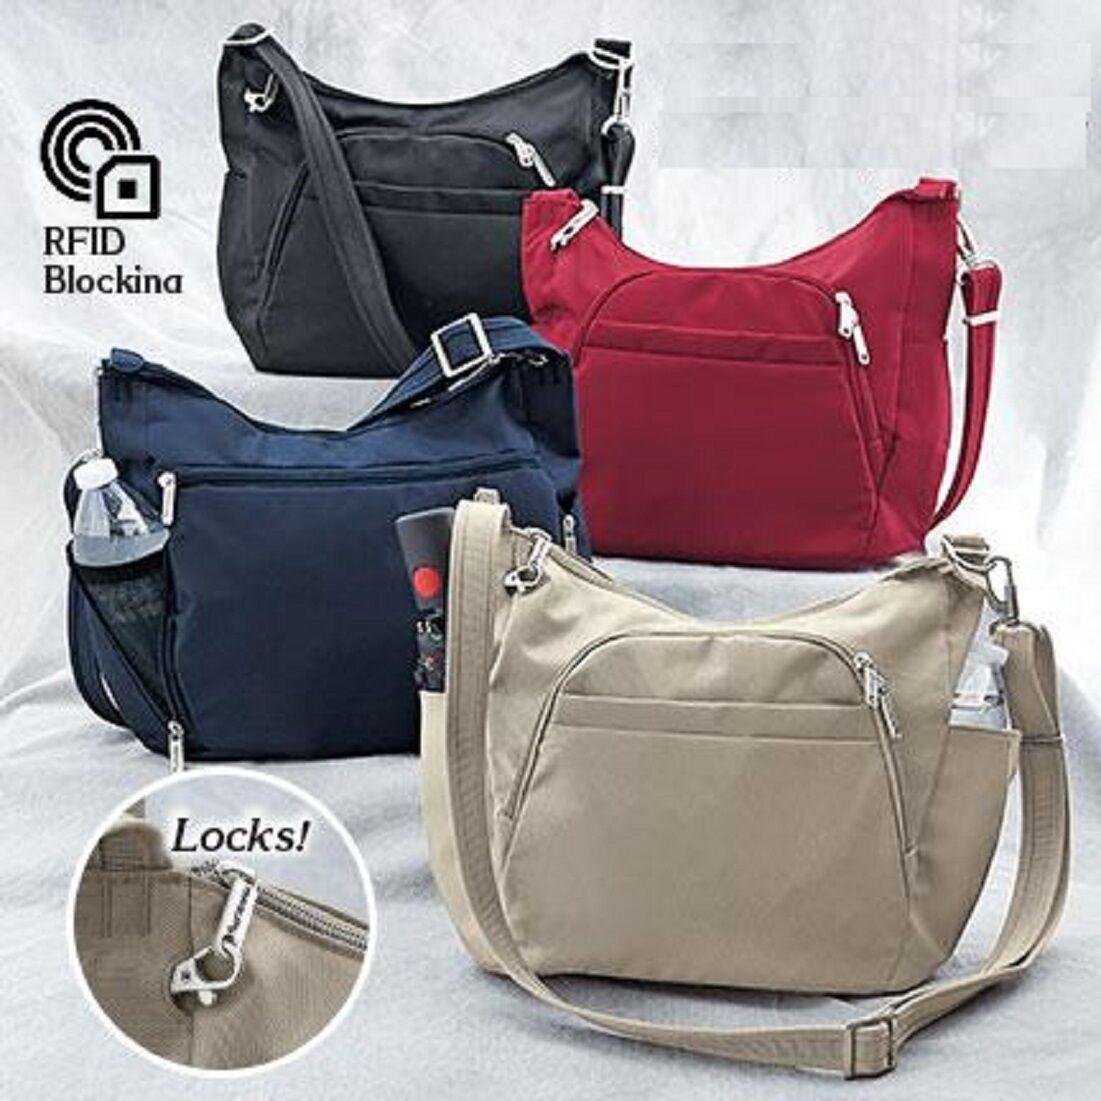 rfid anti theft cross body handbags antitheft